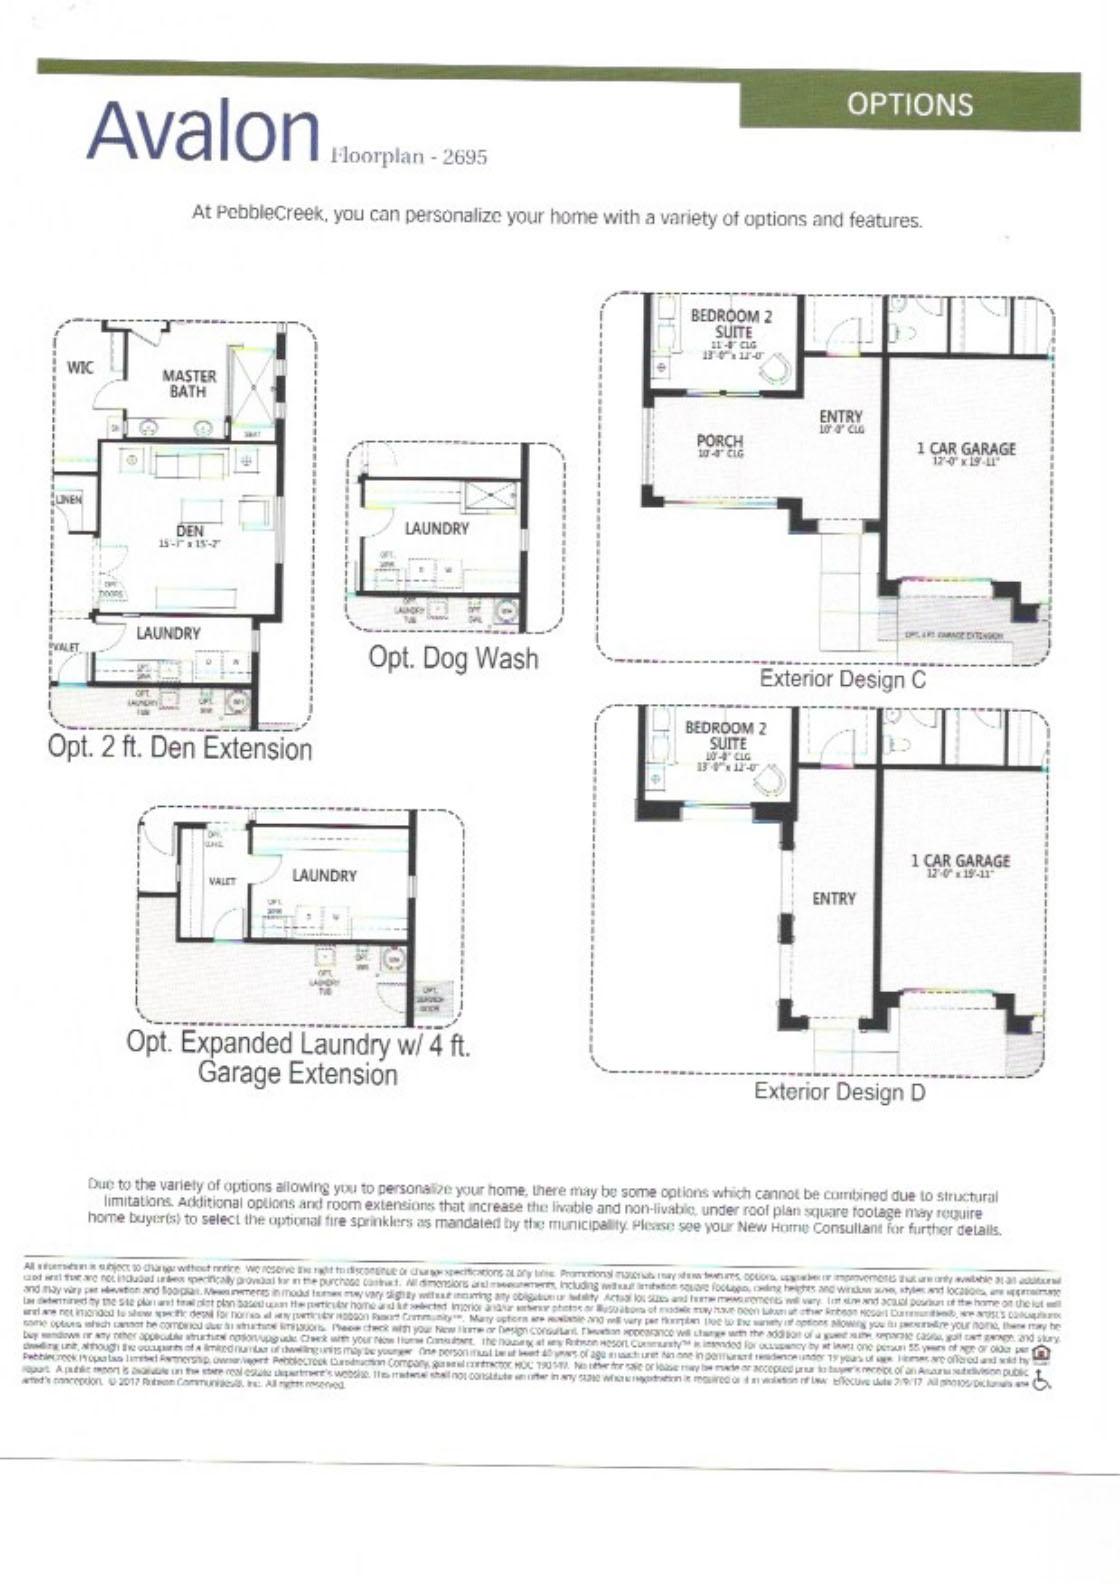 Avalon 2695  (with options).pdf